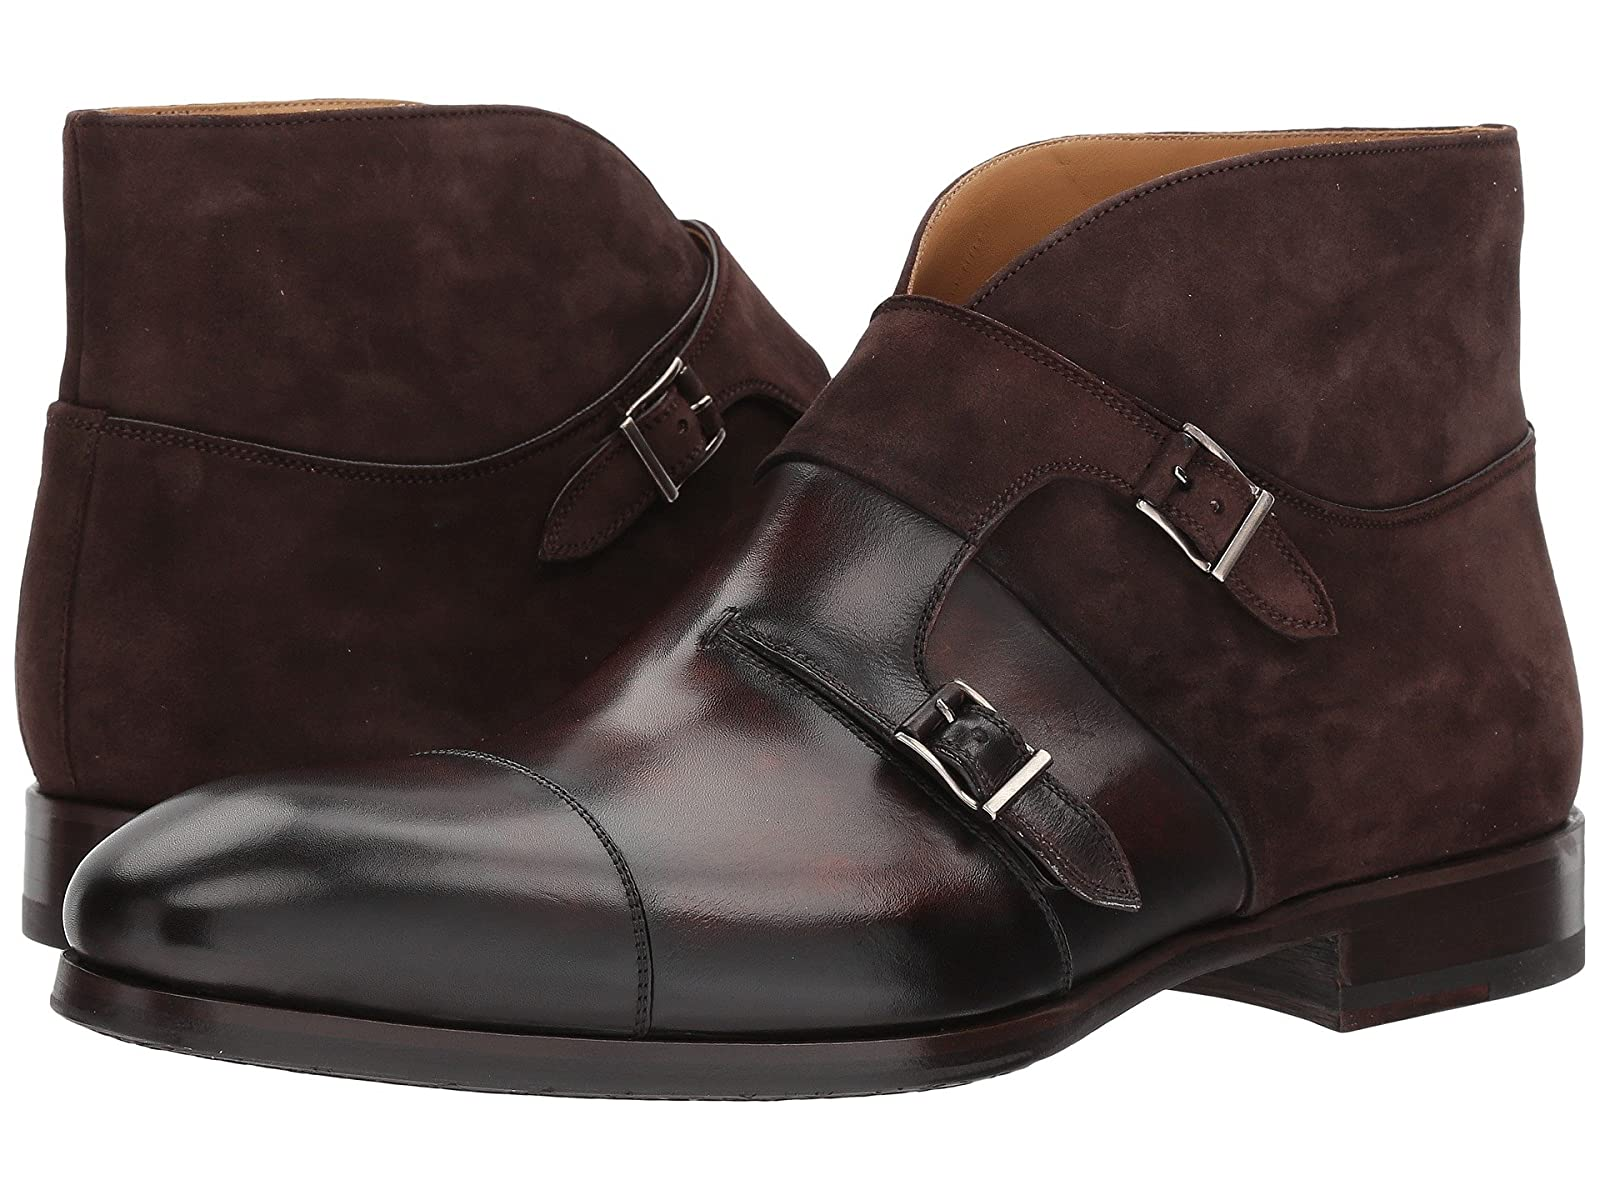 Magnanni OctavianAffordable and distinctive shoes